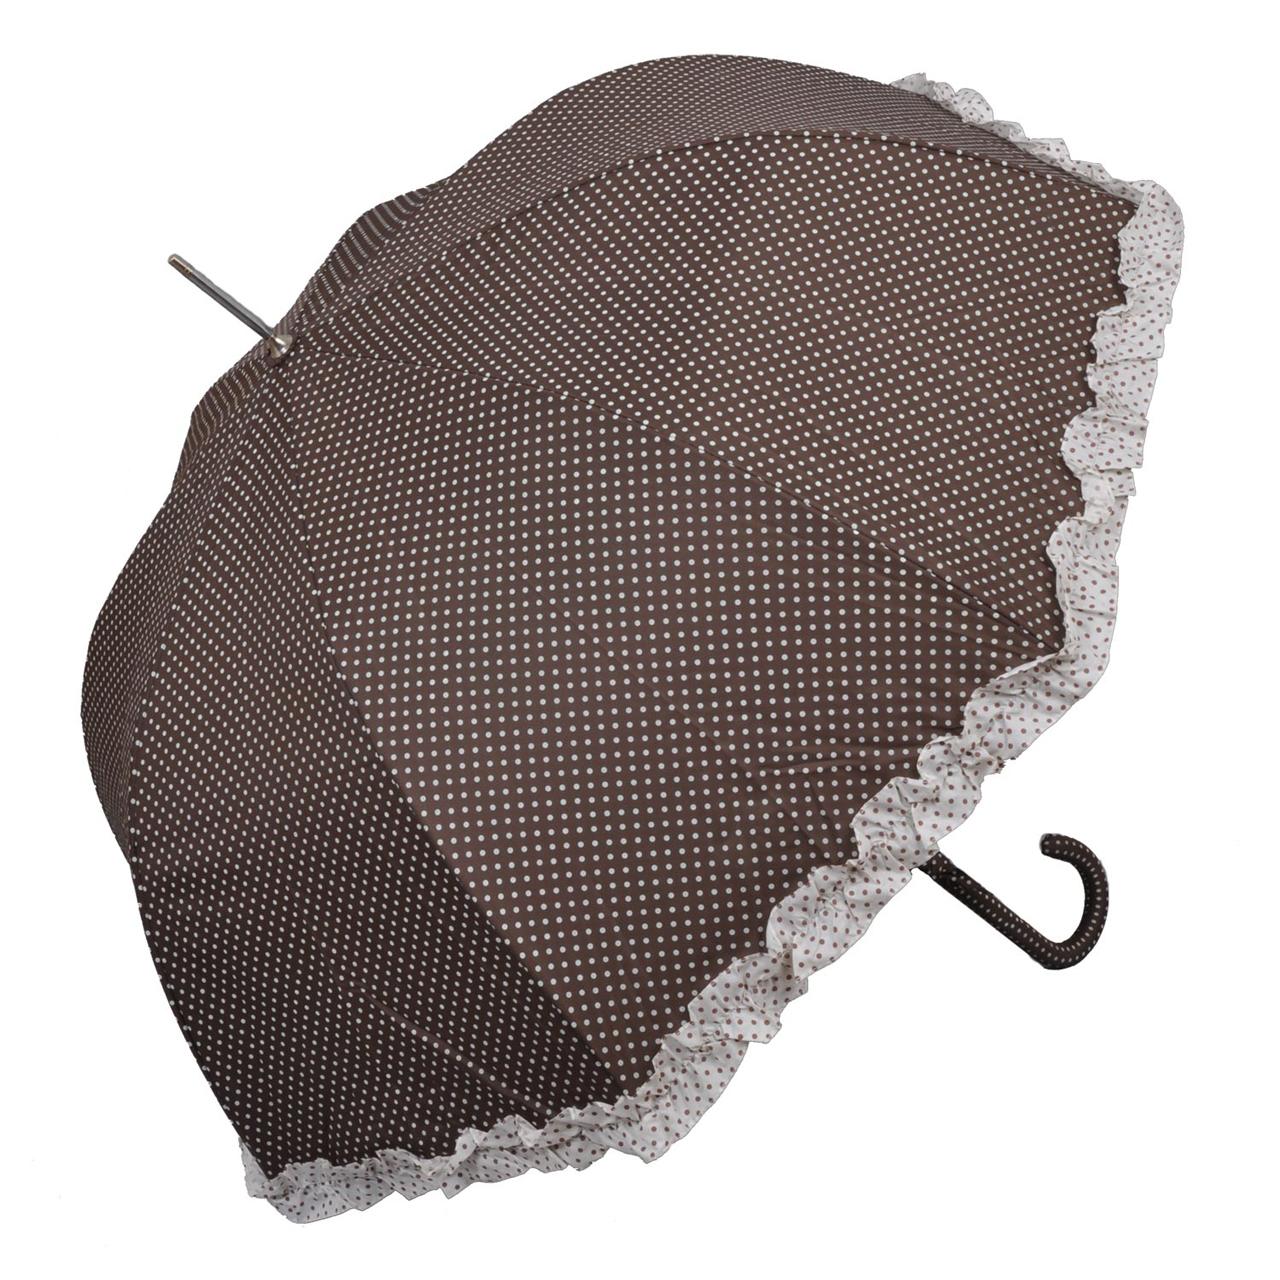 Umbrela Cu Buline Din Textil Maro